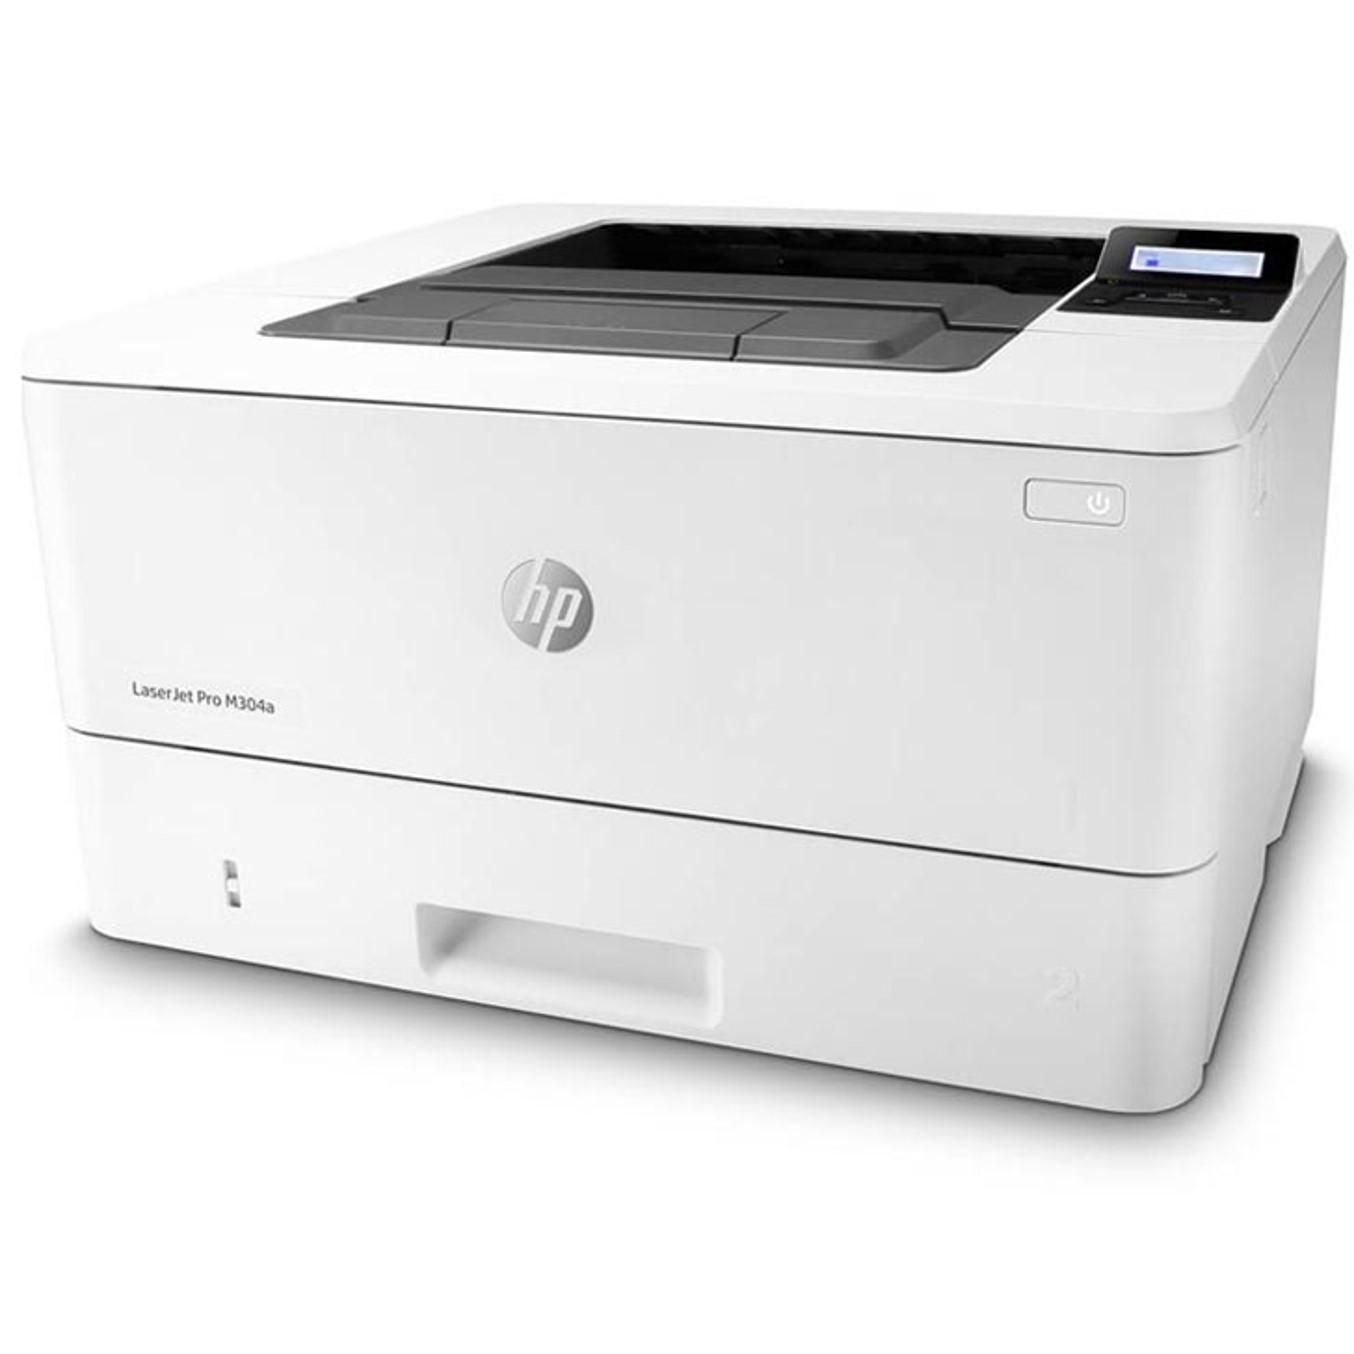 IMPRESORA HP LASER MONOCROMO LASERJET PRO M304A A4/ 35PPM/ 256MB/ USB